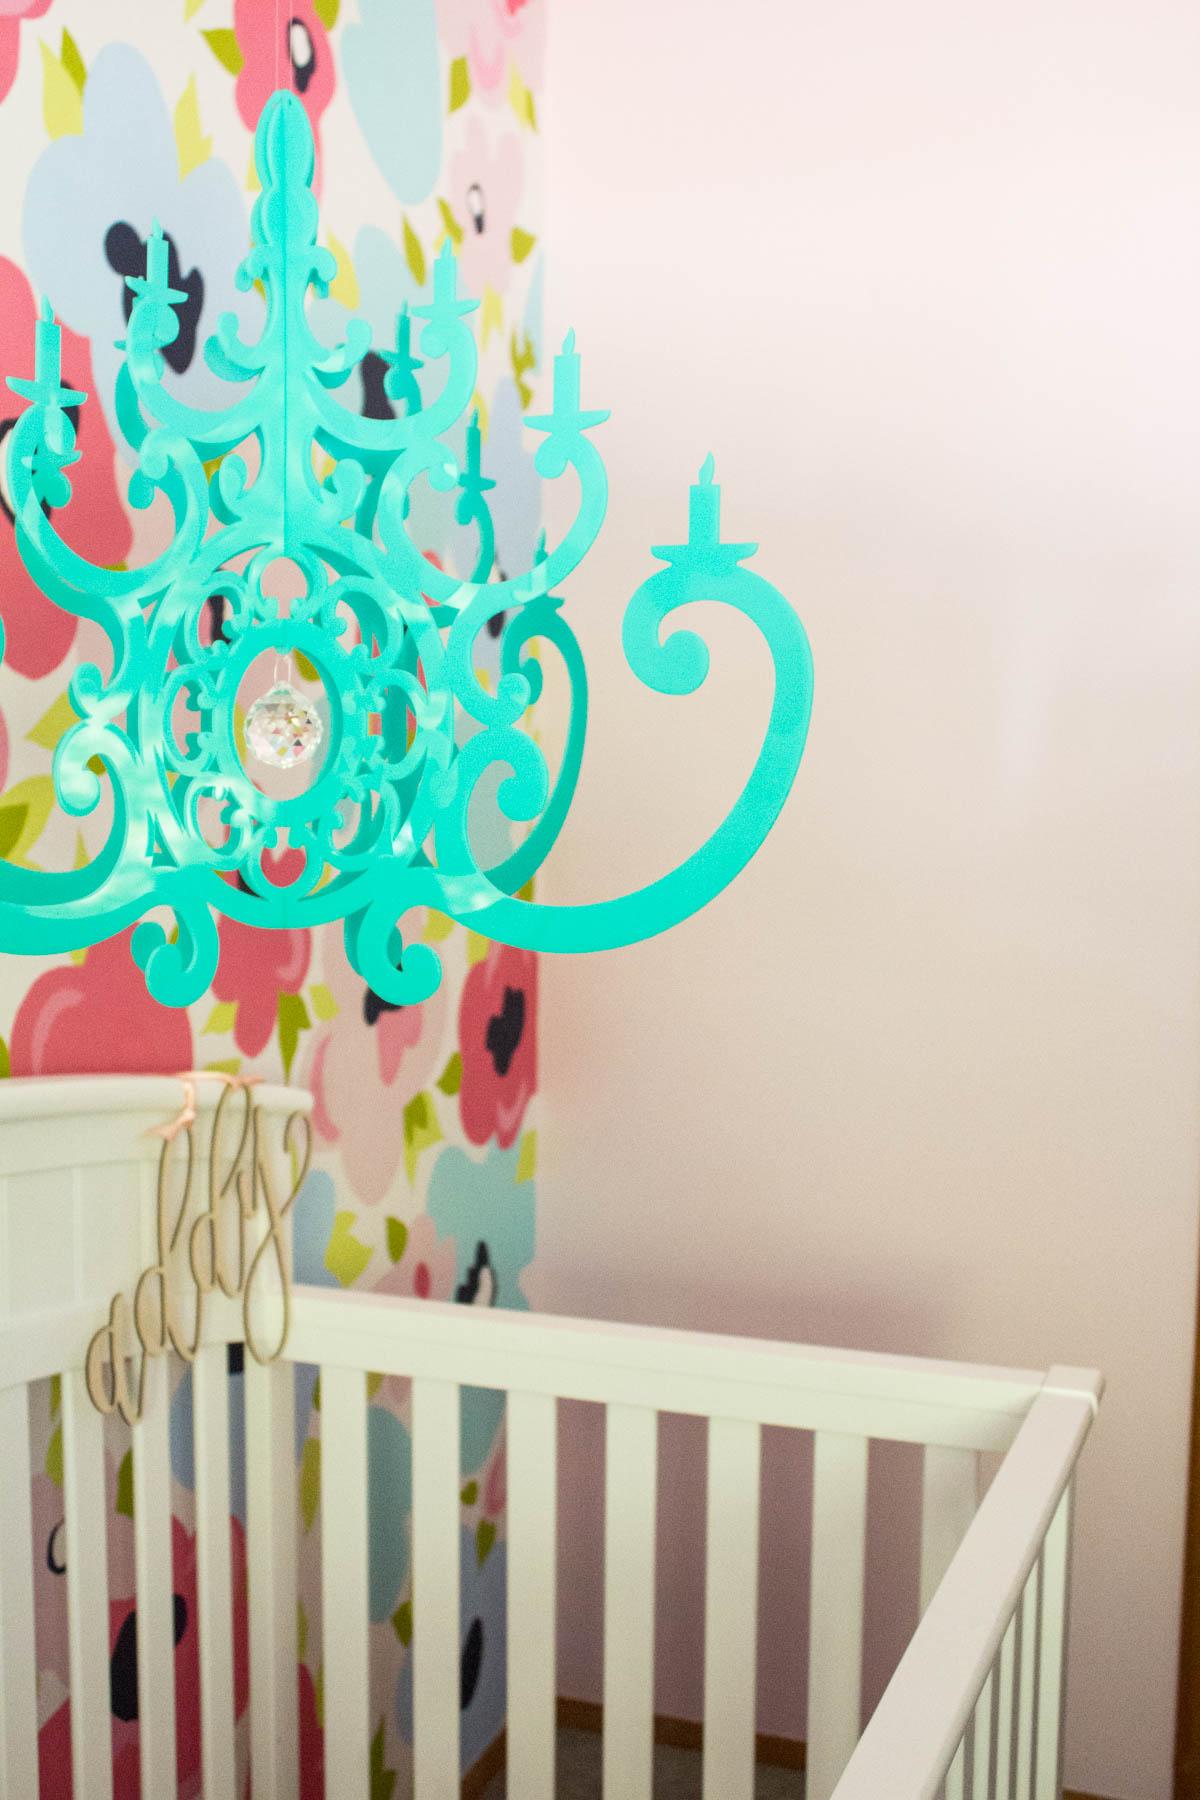 chandelier2-9608.jpg